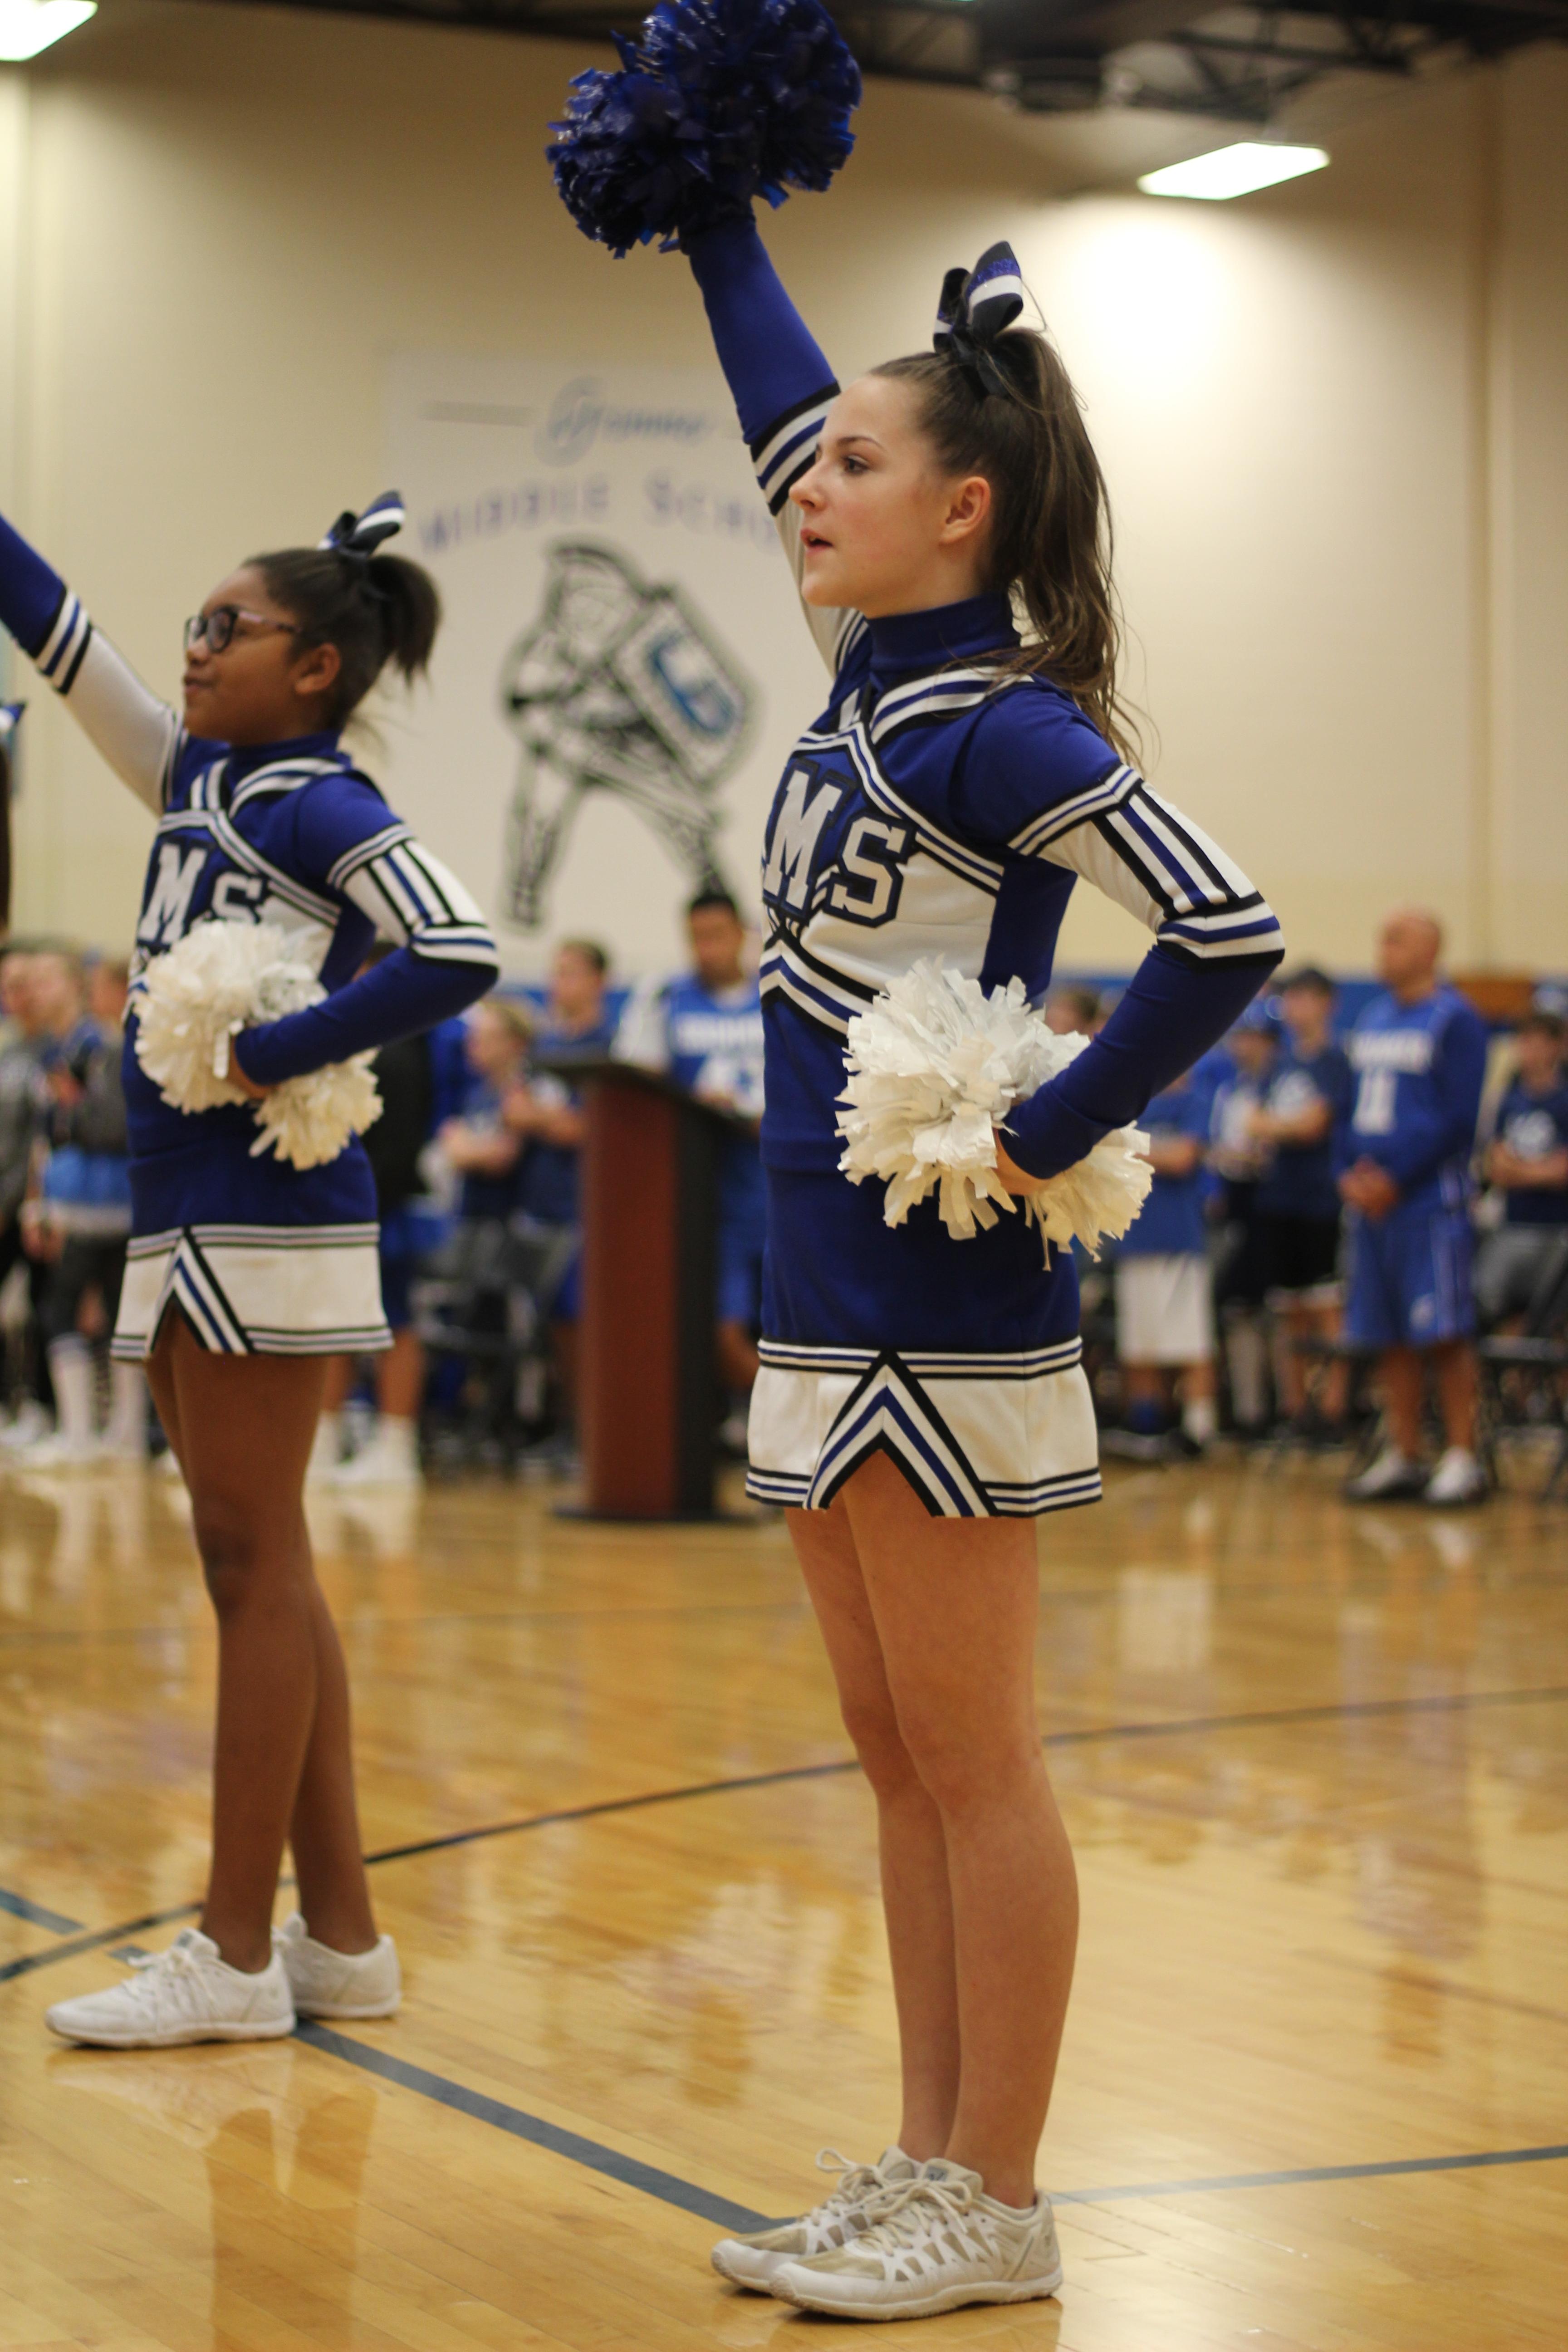 Cheerleader preforms at pep rally